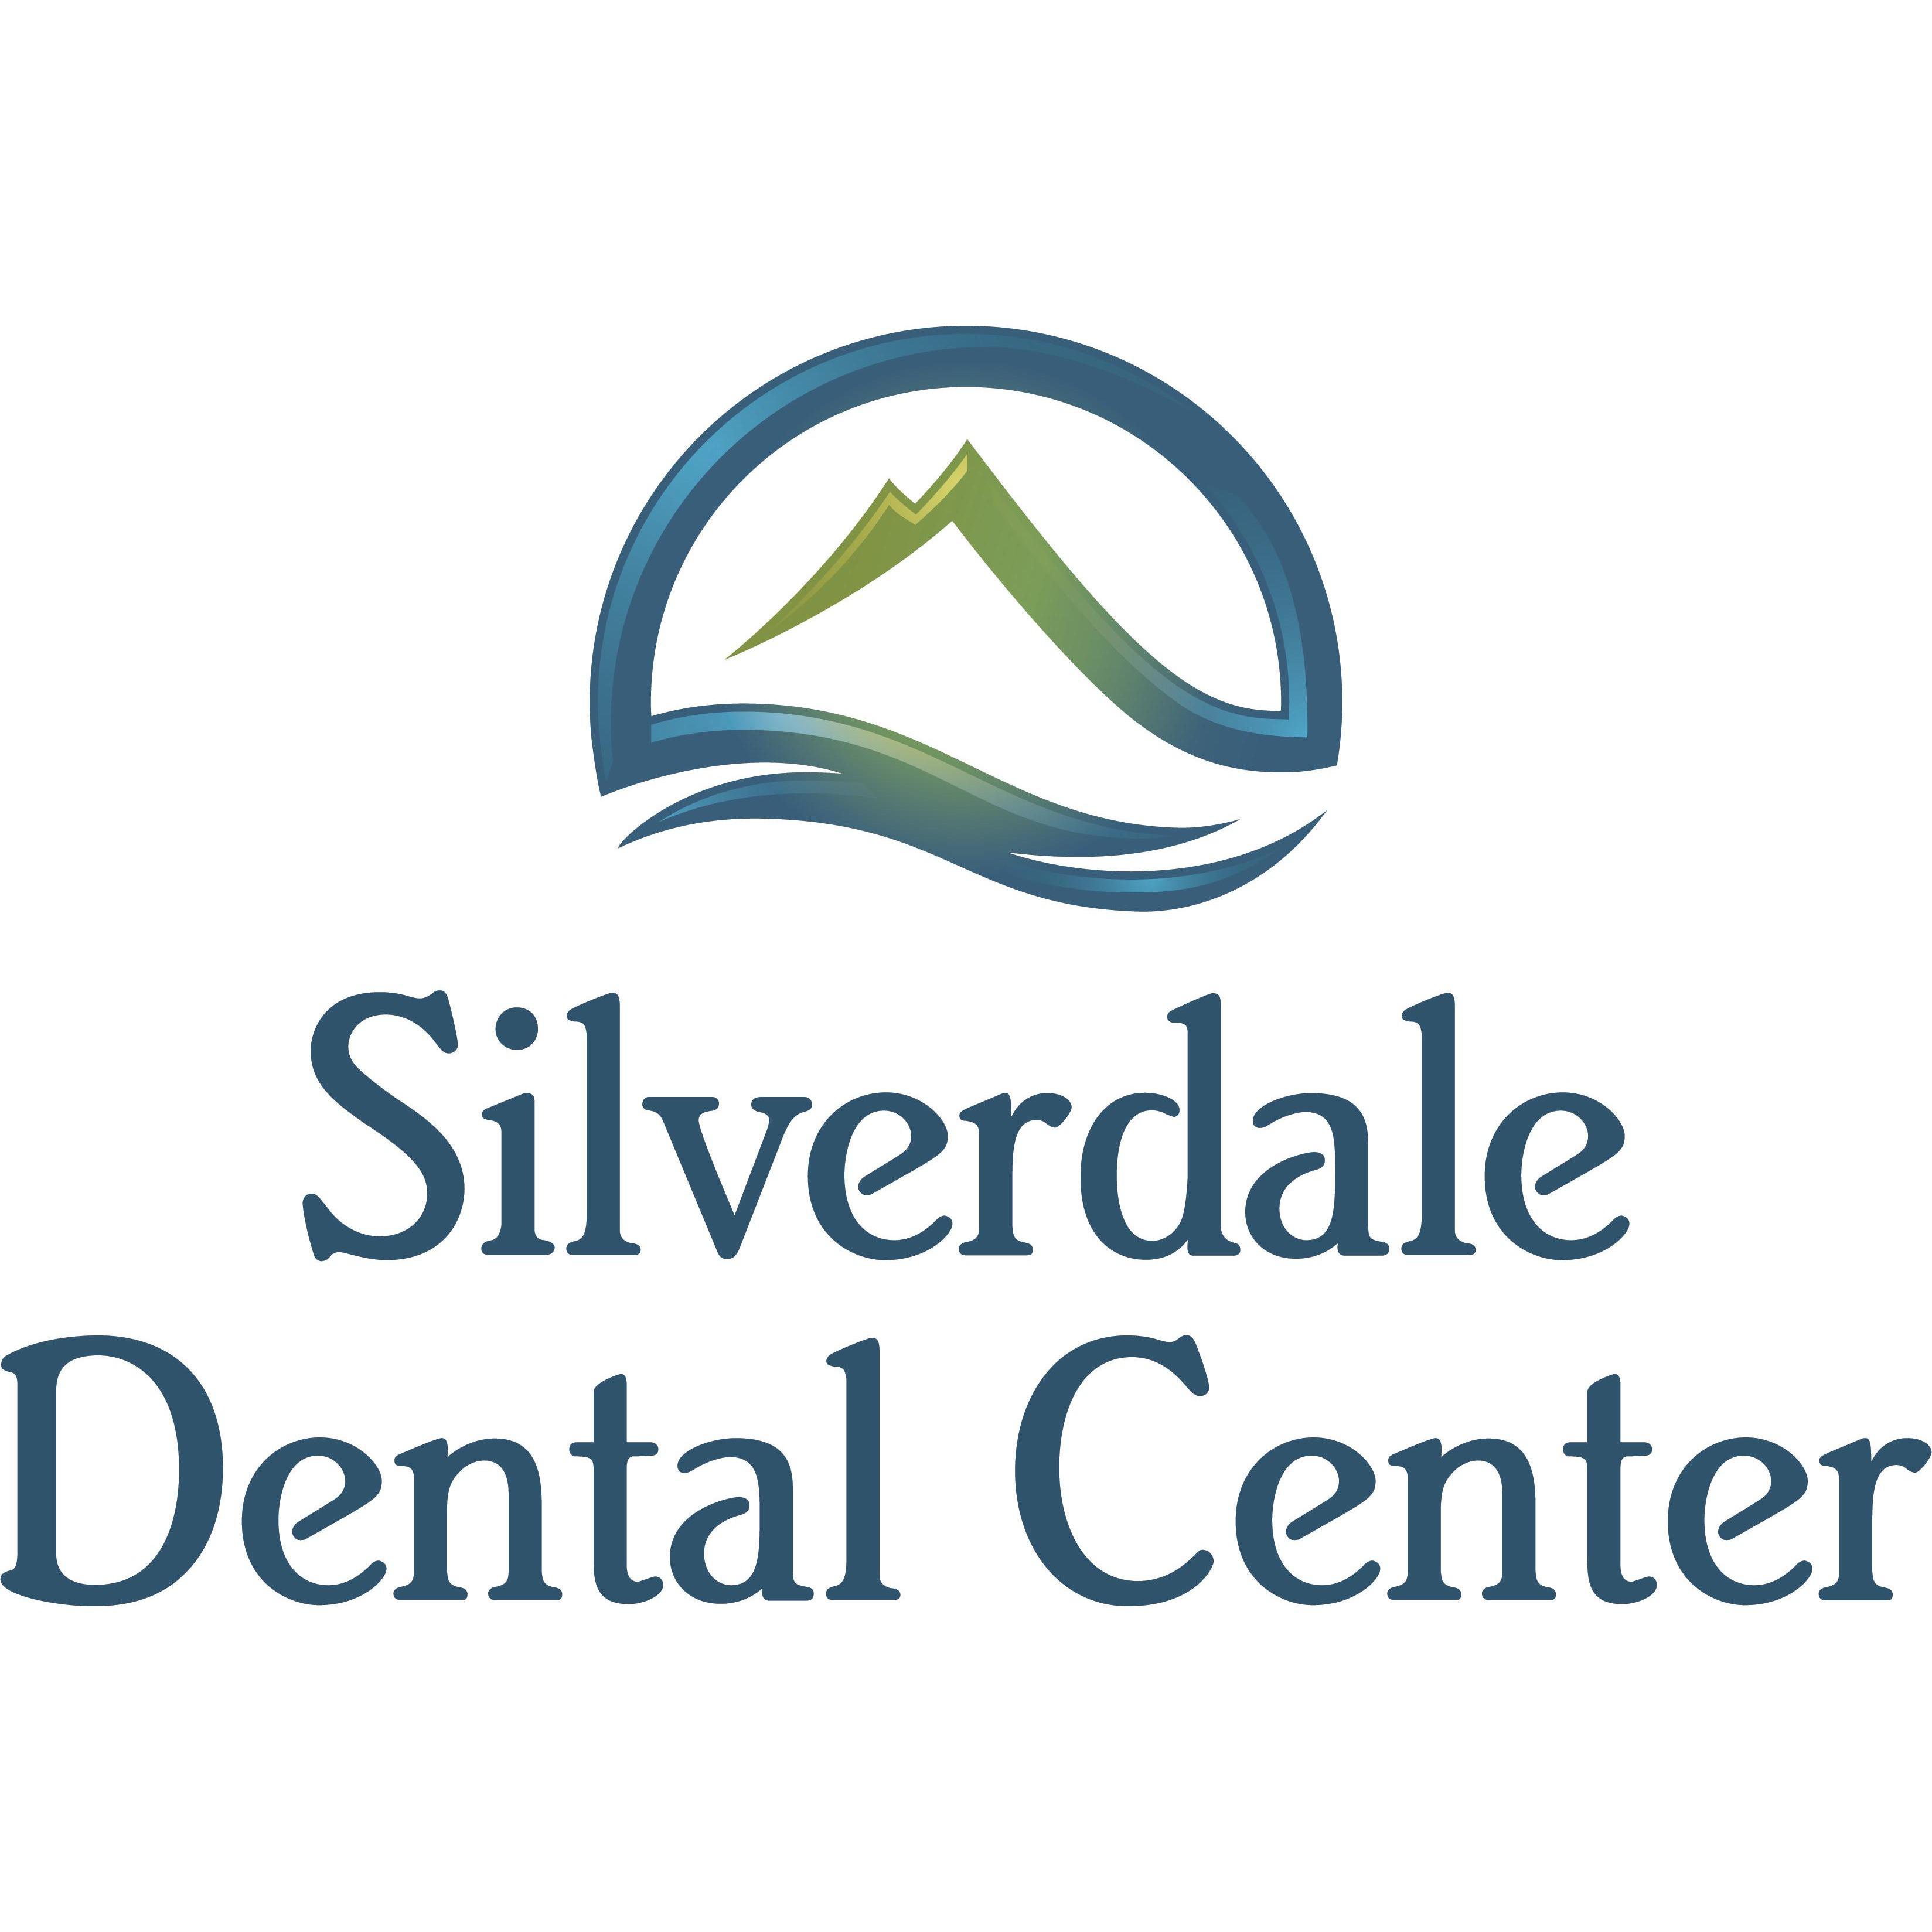 Silverdale Dental Center